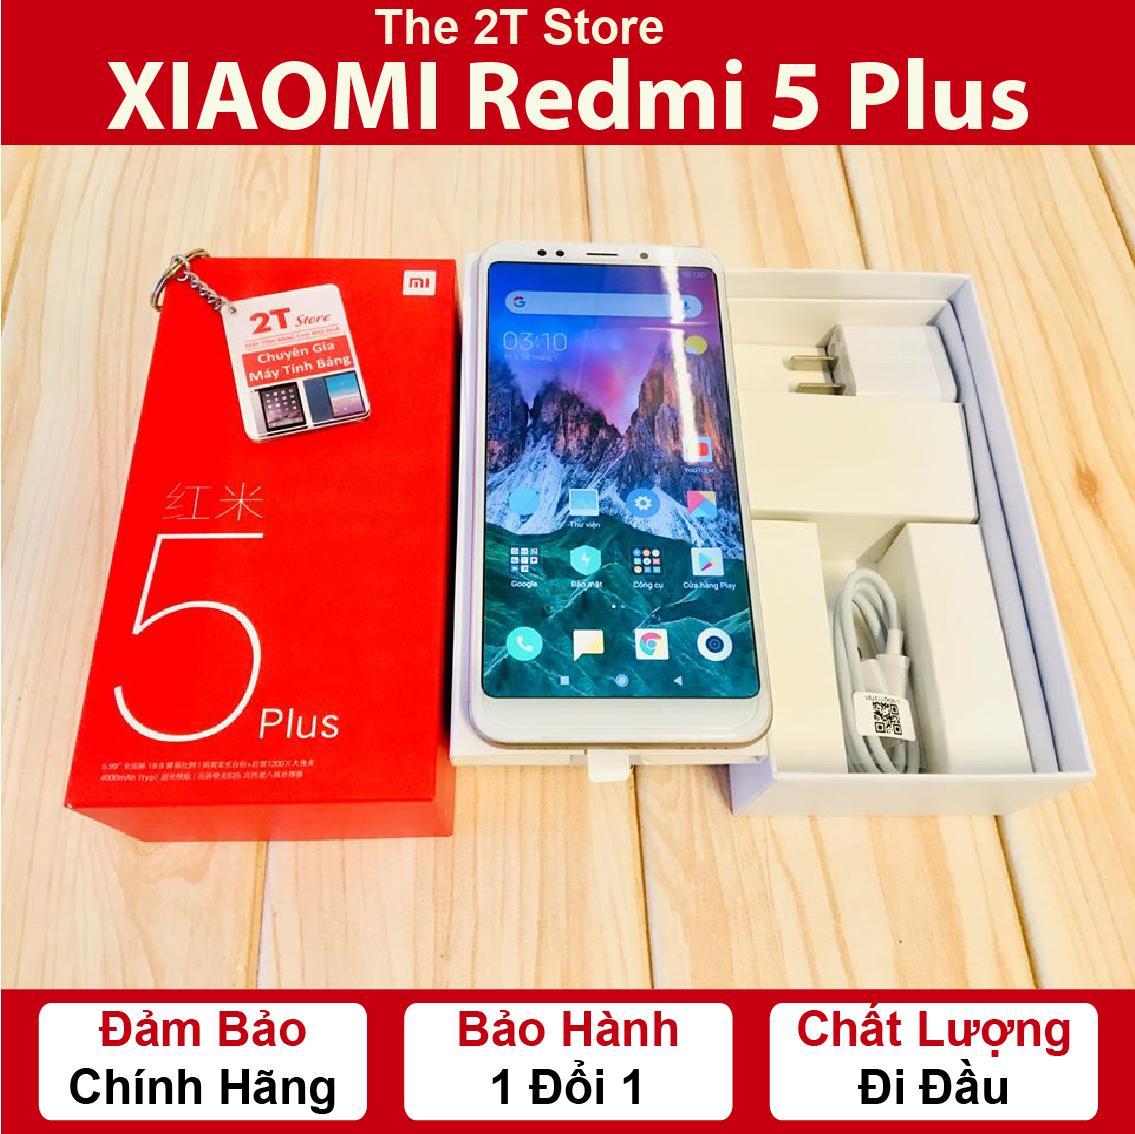 Điện thoại Xiaomi Redmi 5 Plus 3Gb RAM Fullbox đẹp